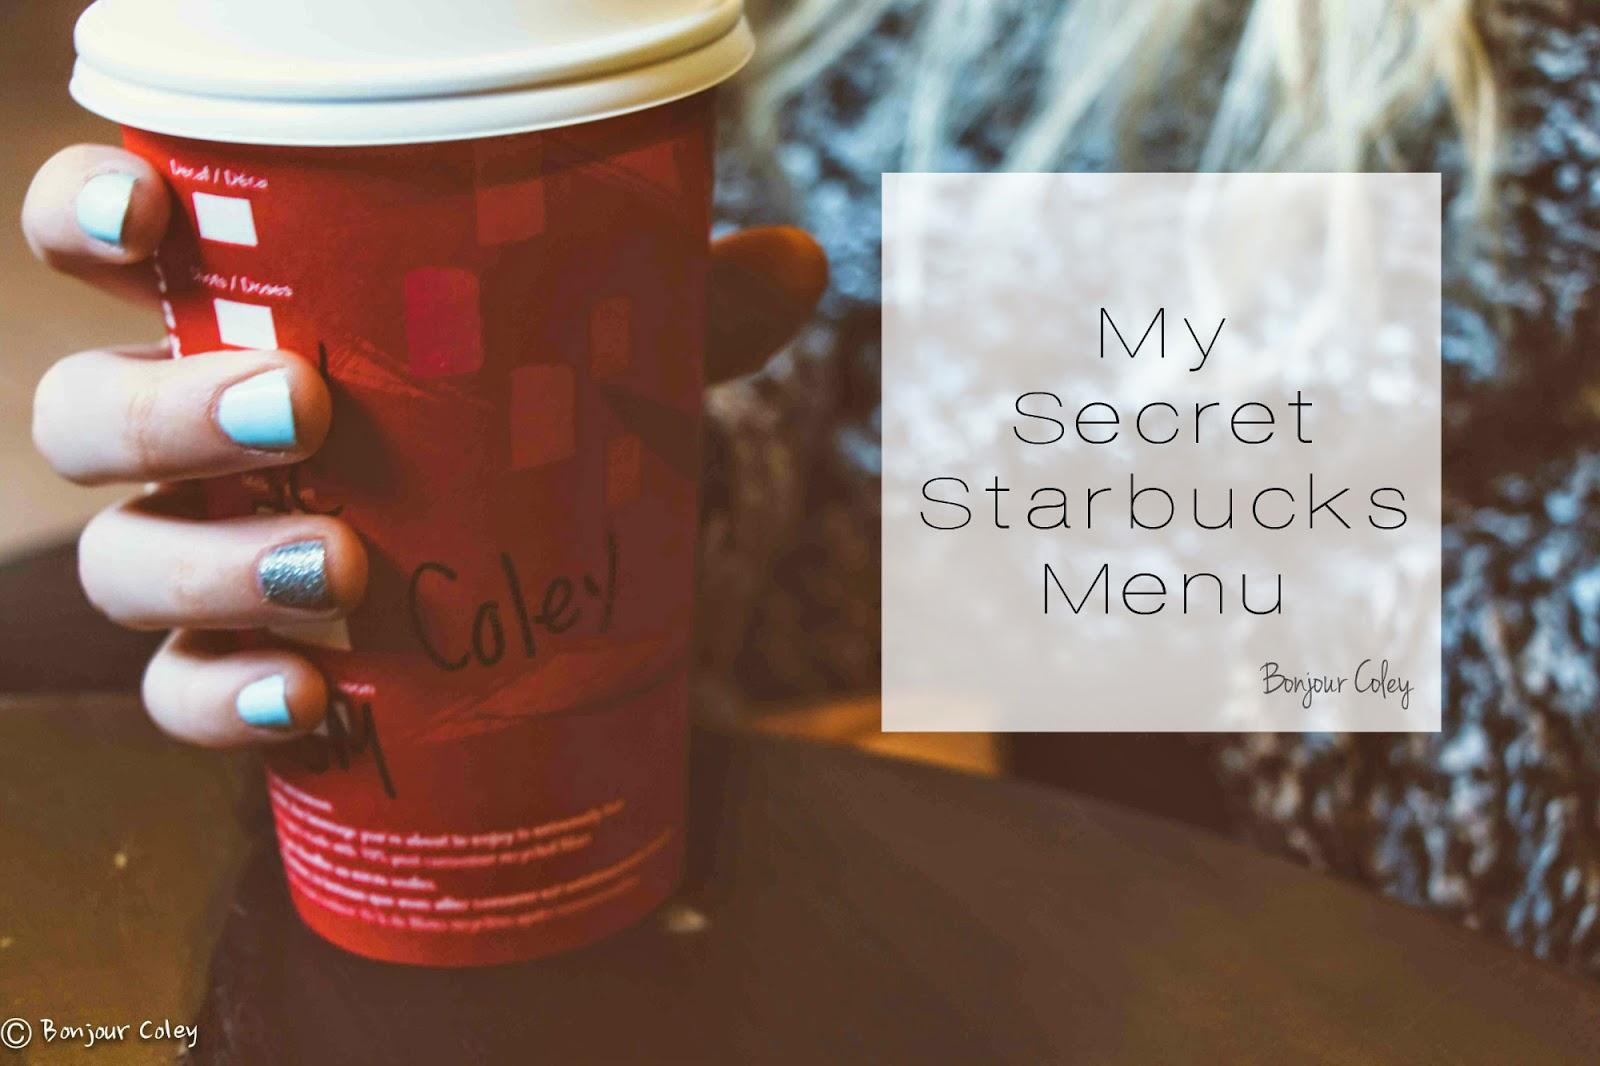 Starbucks-secret-menu-bonjourcoley-title1.jpg